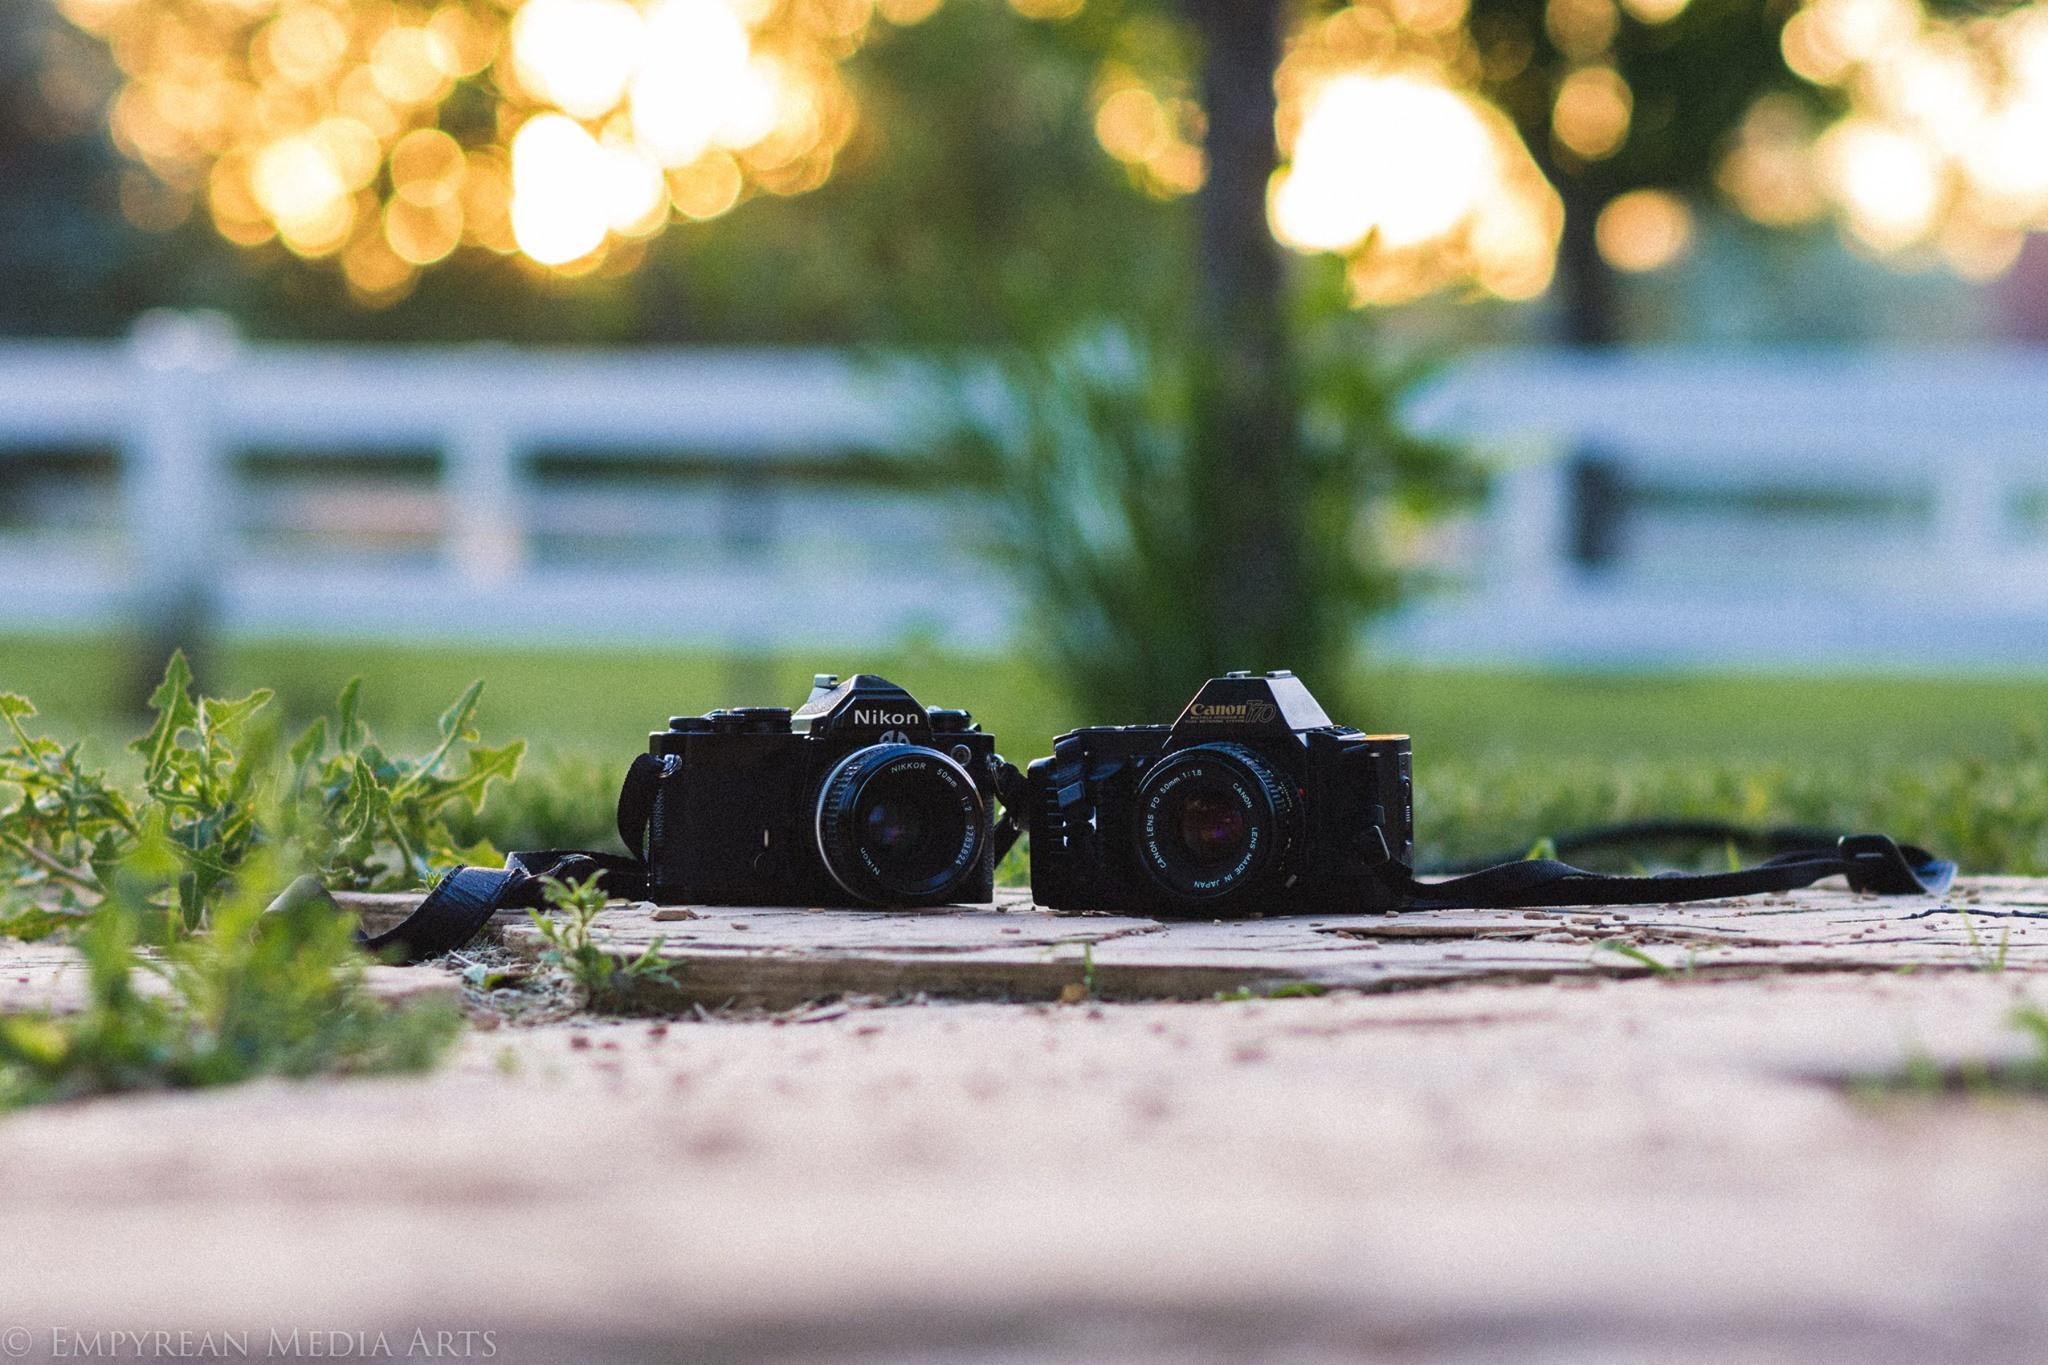 Shoot On Film!